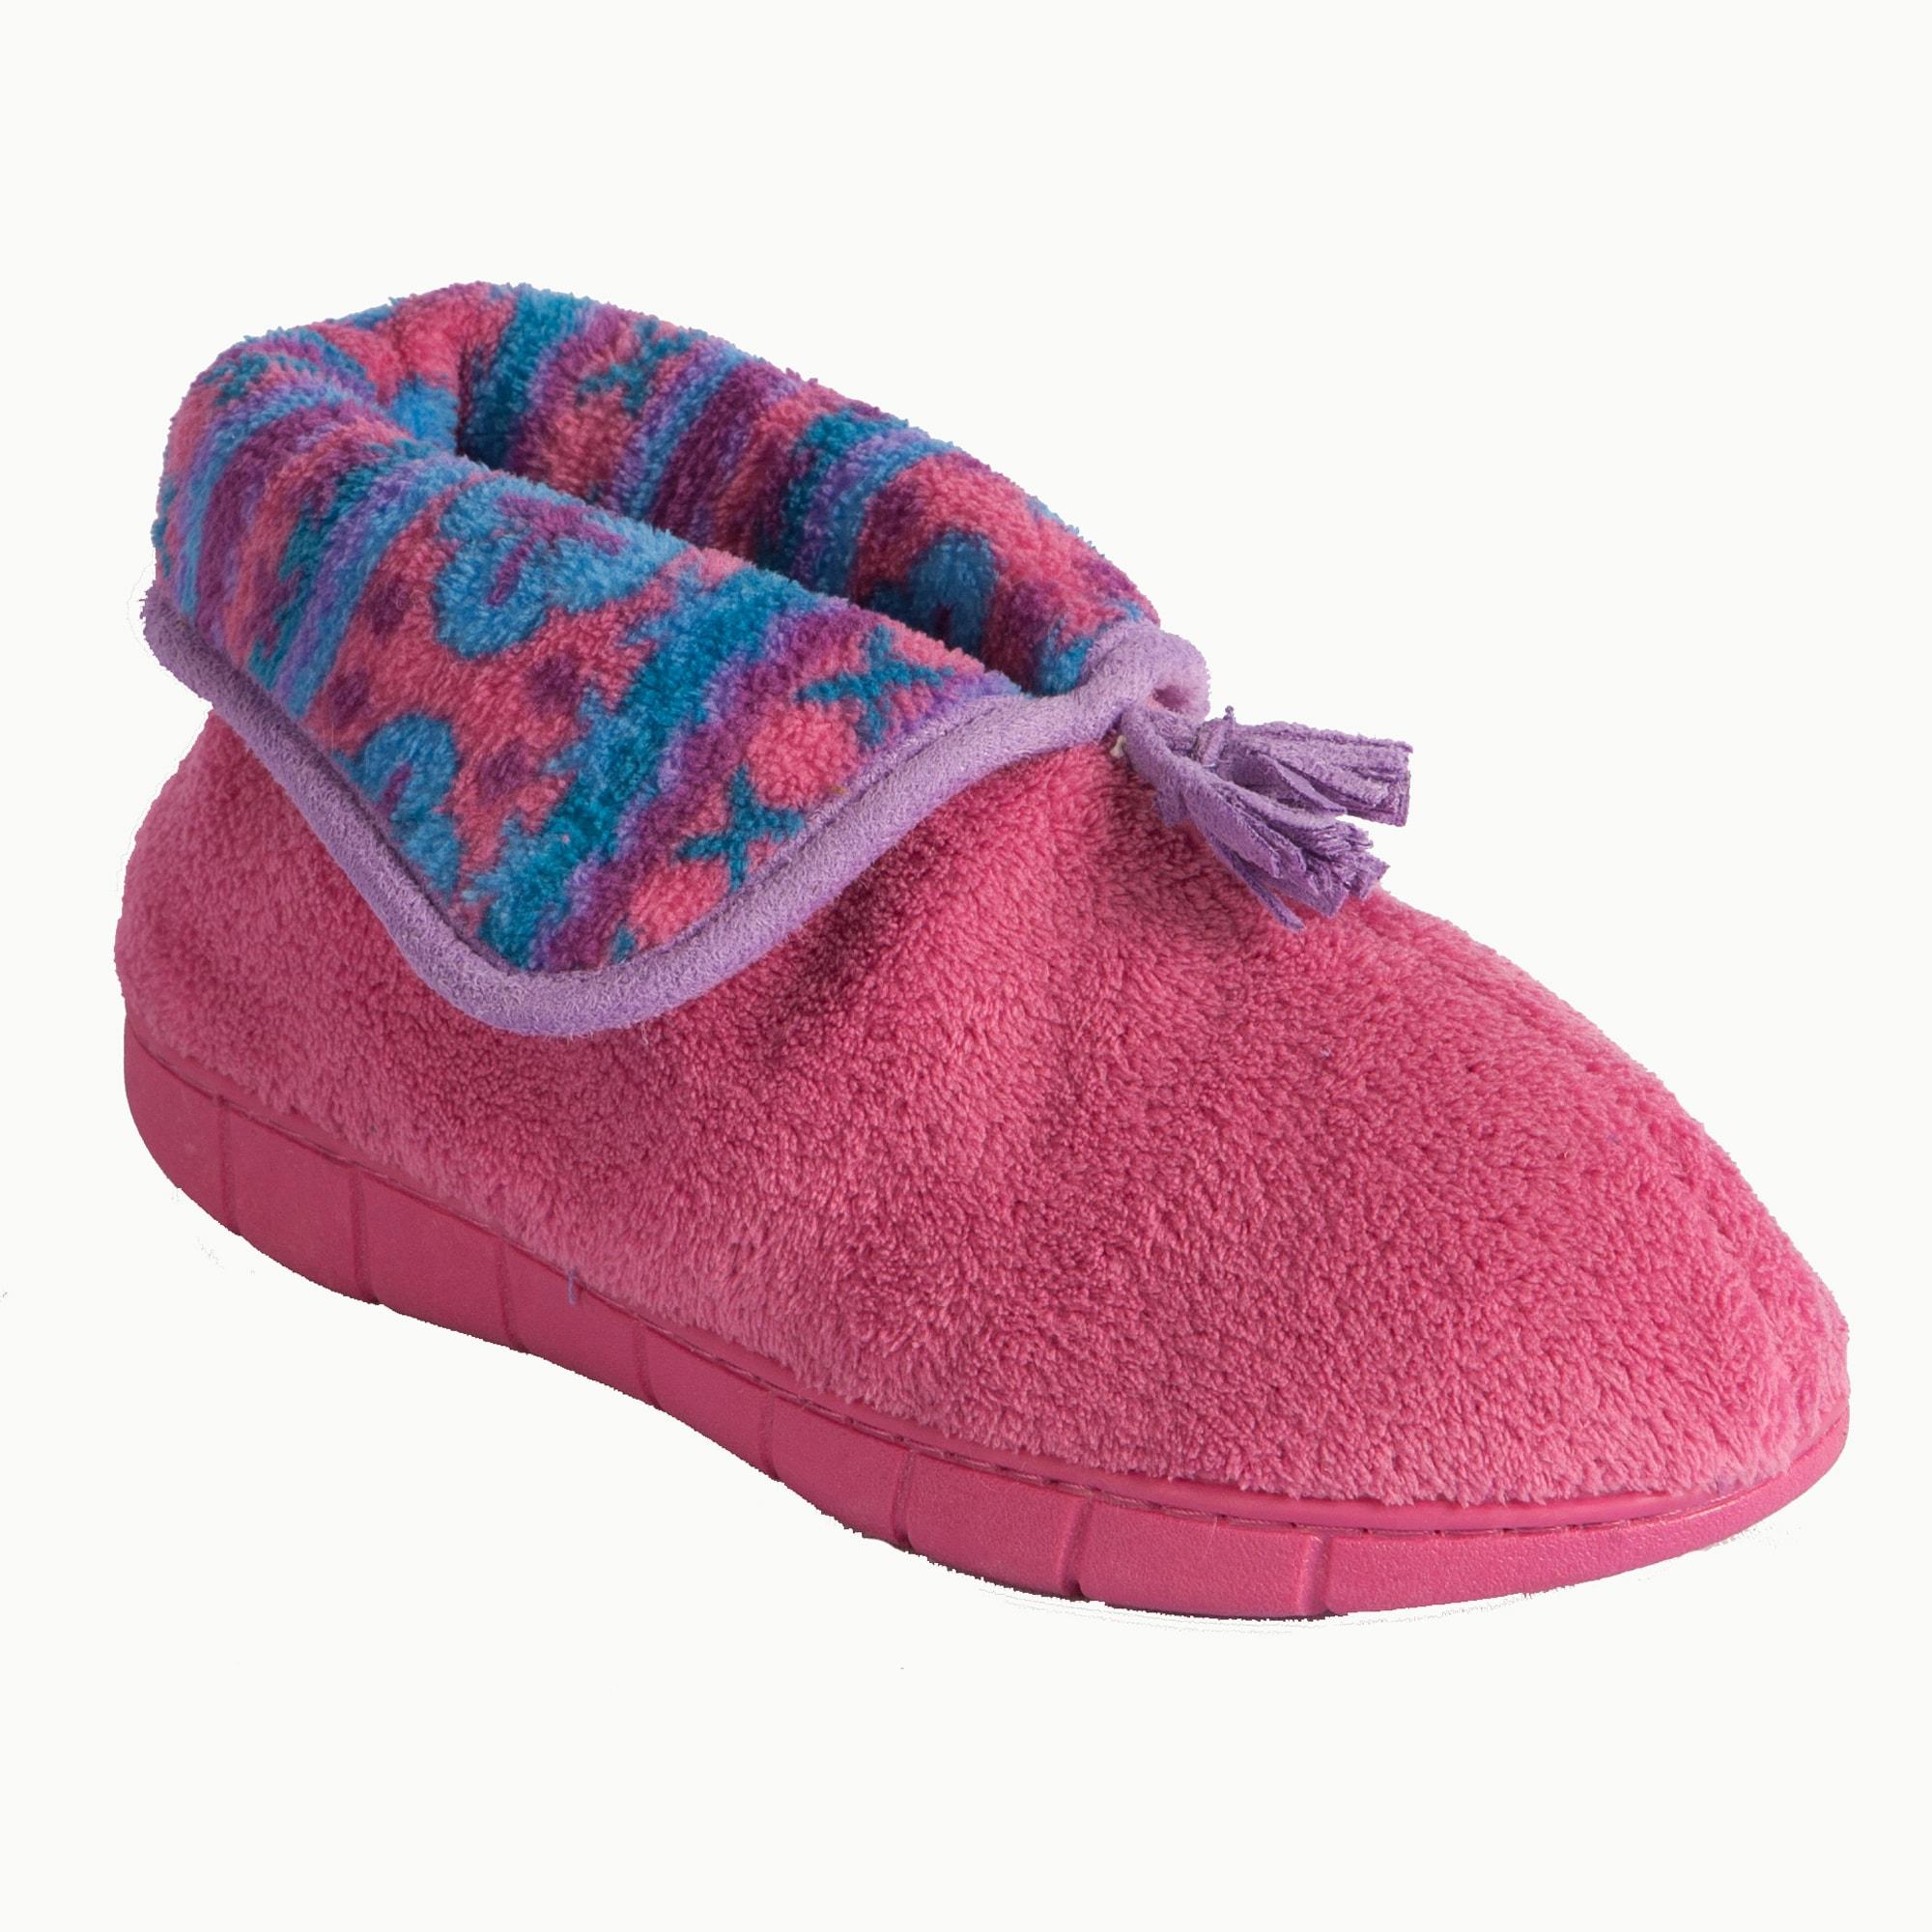 Muk Luks Women's Pink Fleece Slippers